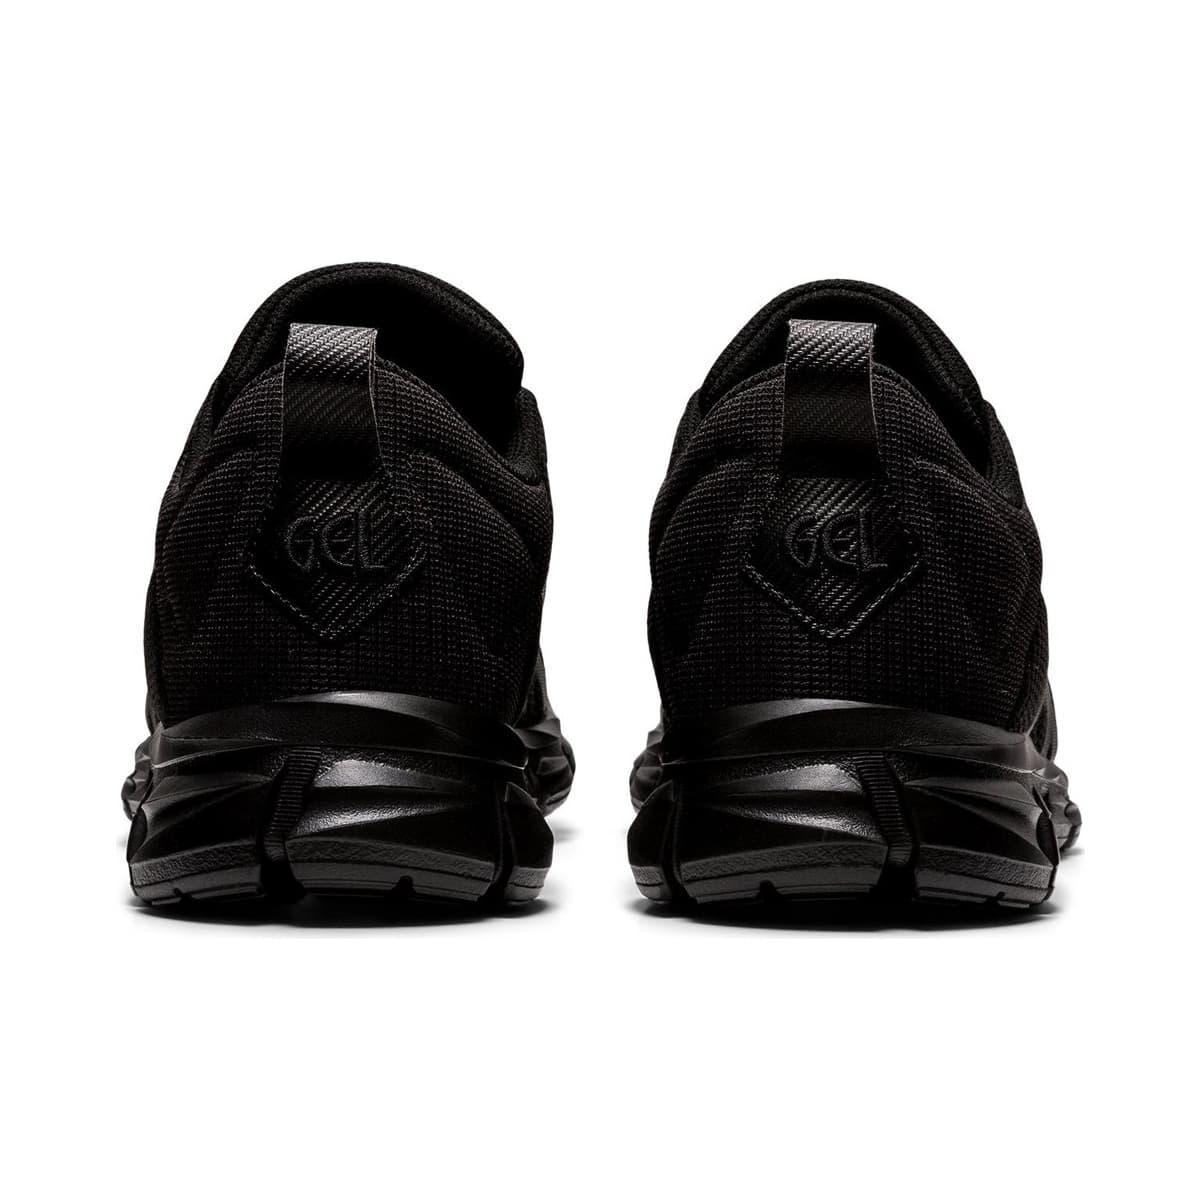 Gel-Quantum Lyte Erkek Siyah Spor Ayakkabı (1201A235-004)